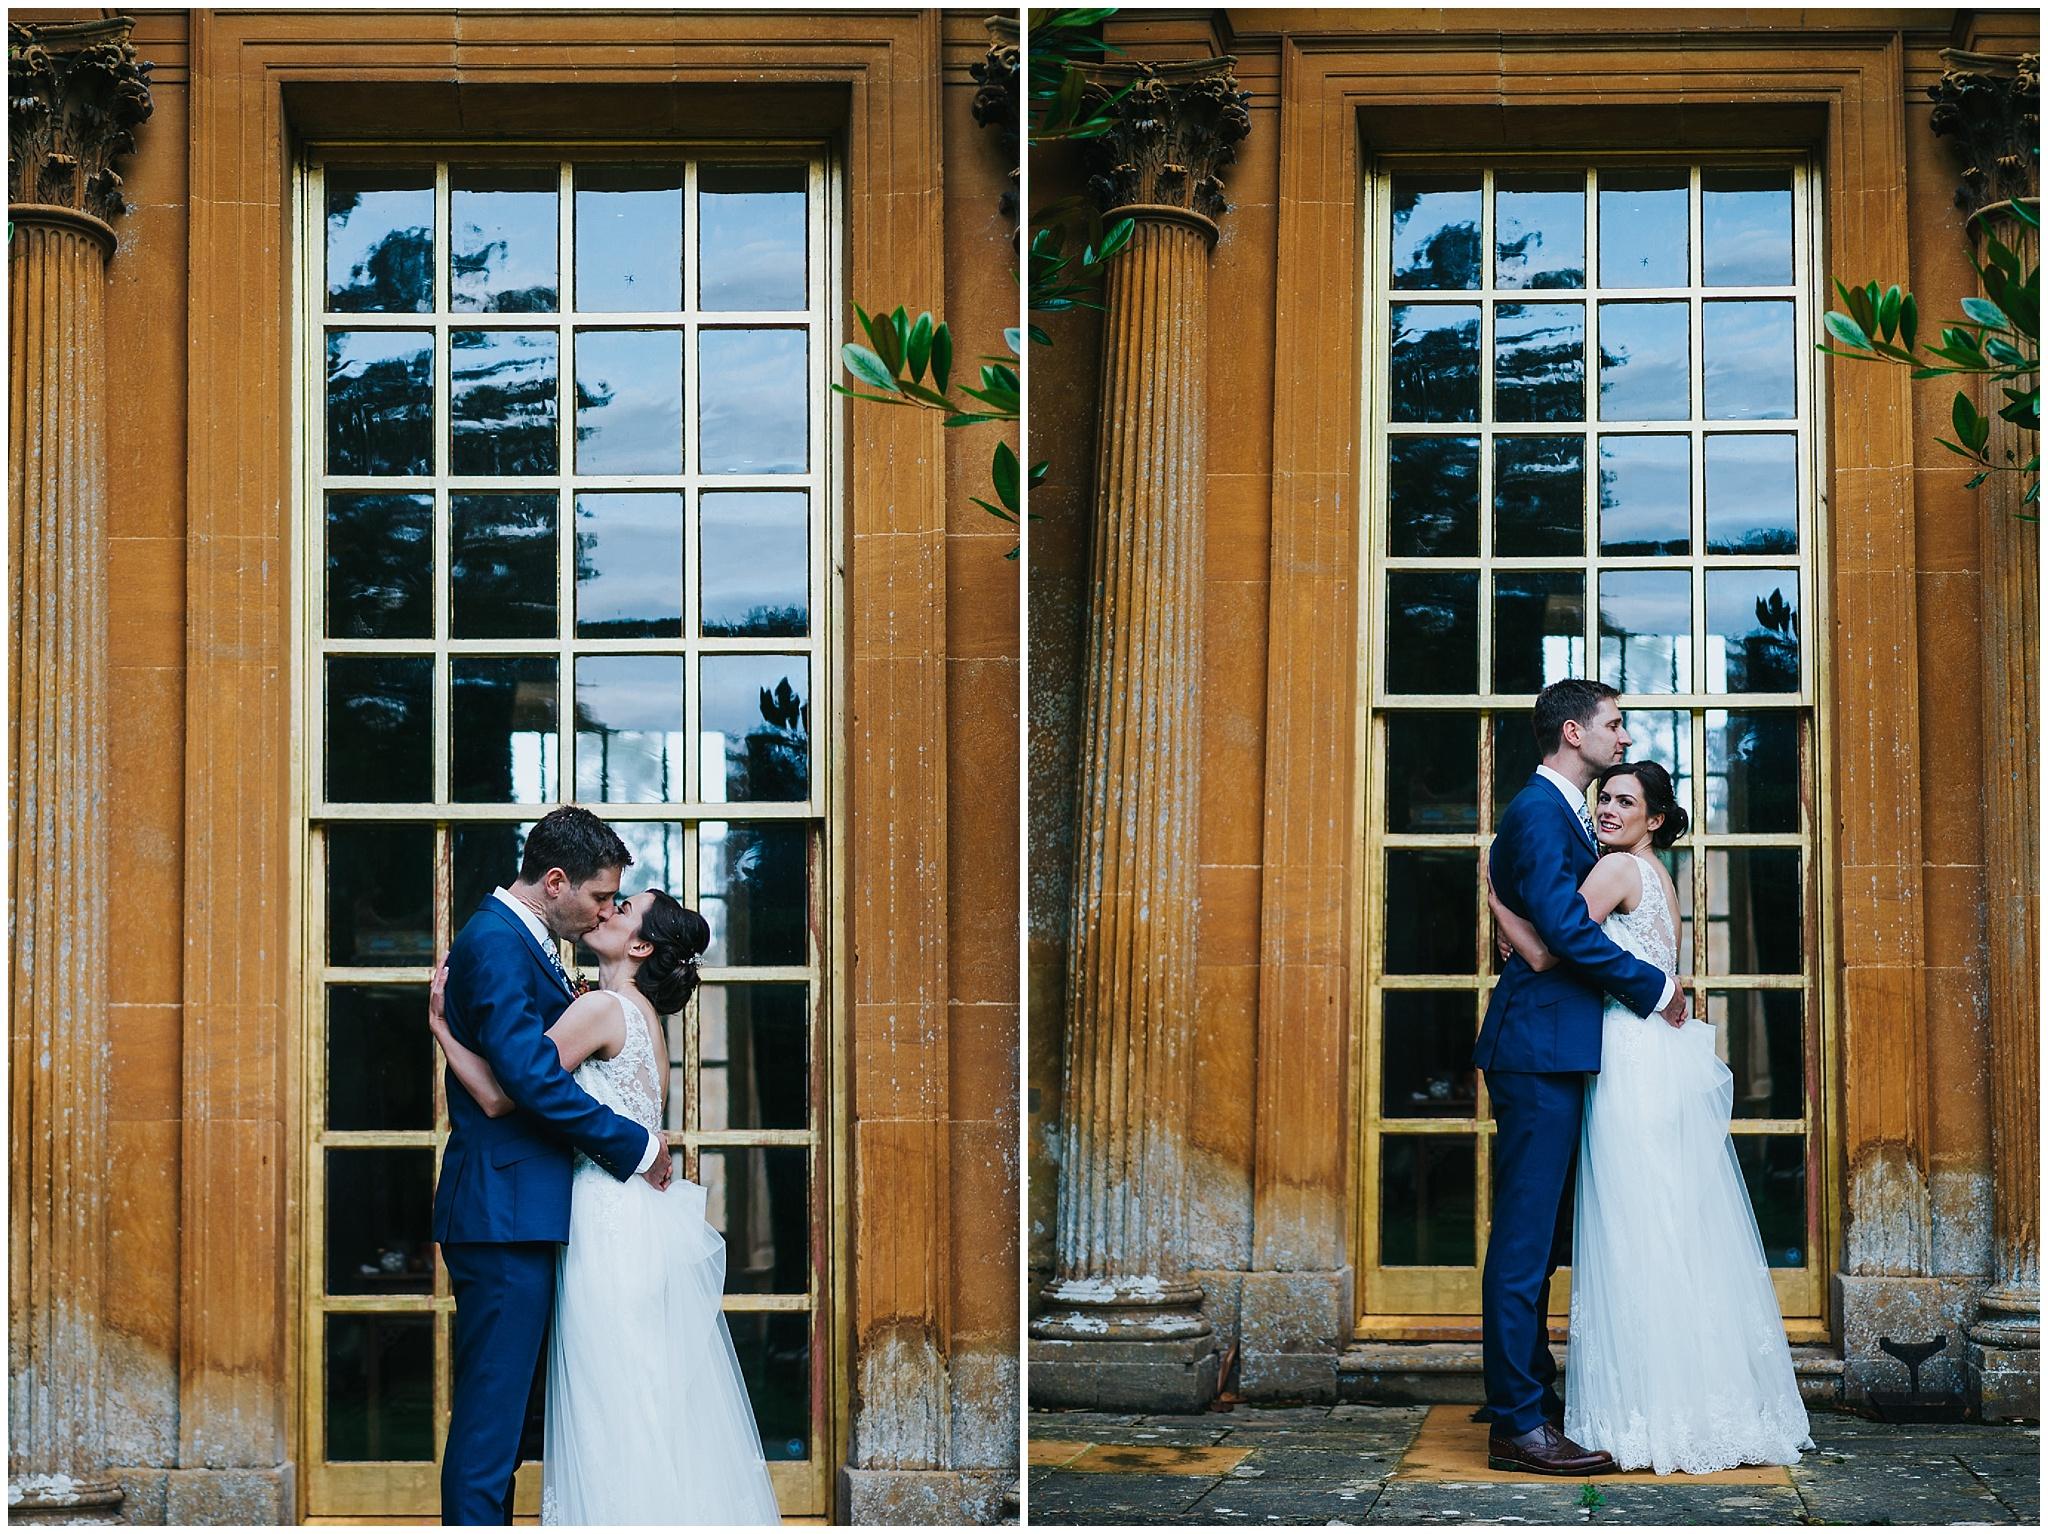 Stanway House Gloucester wedding photography097